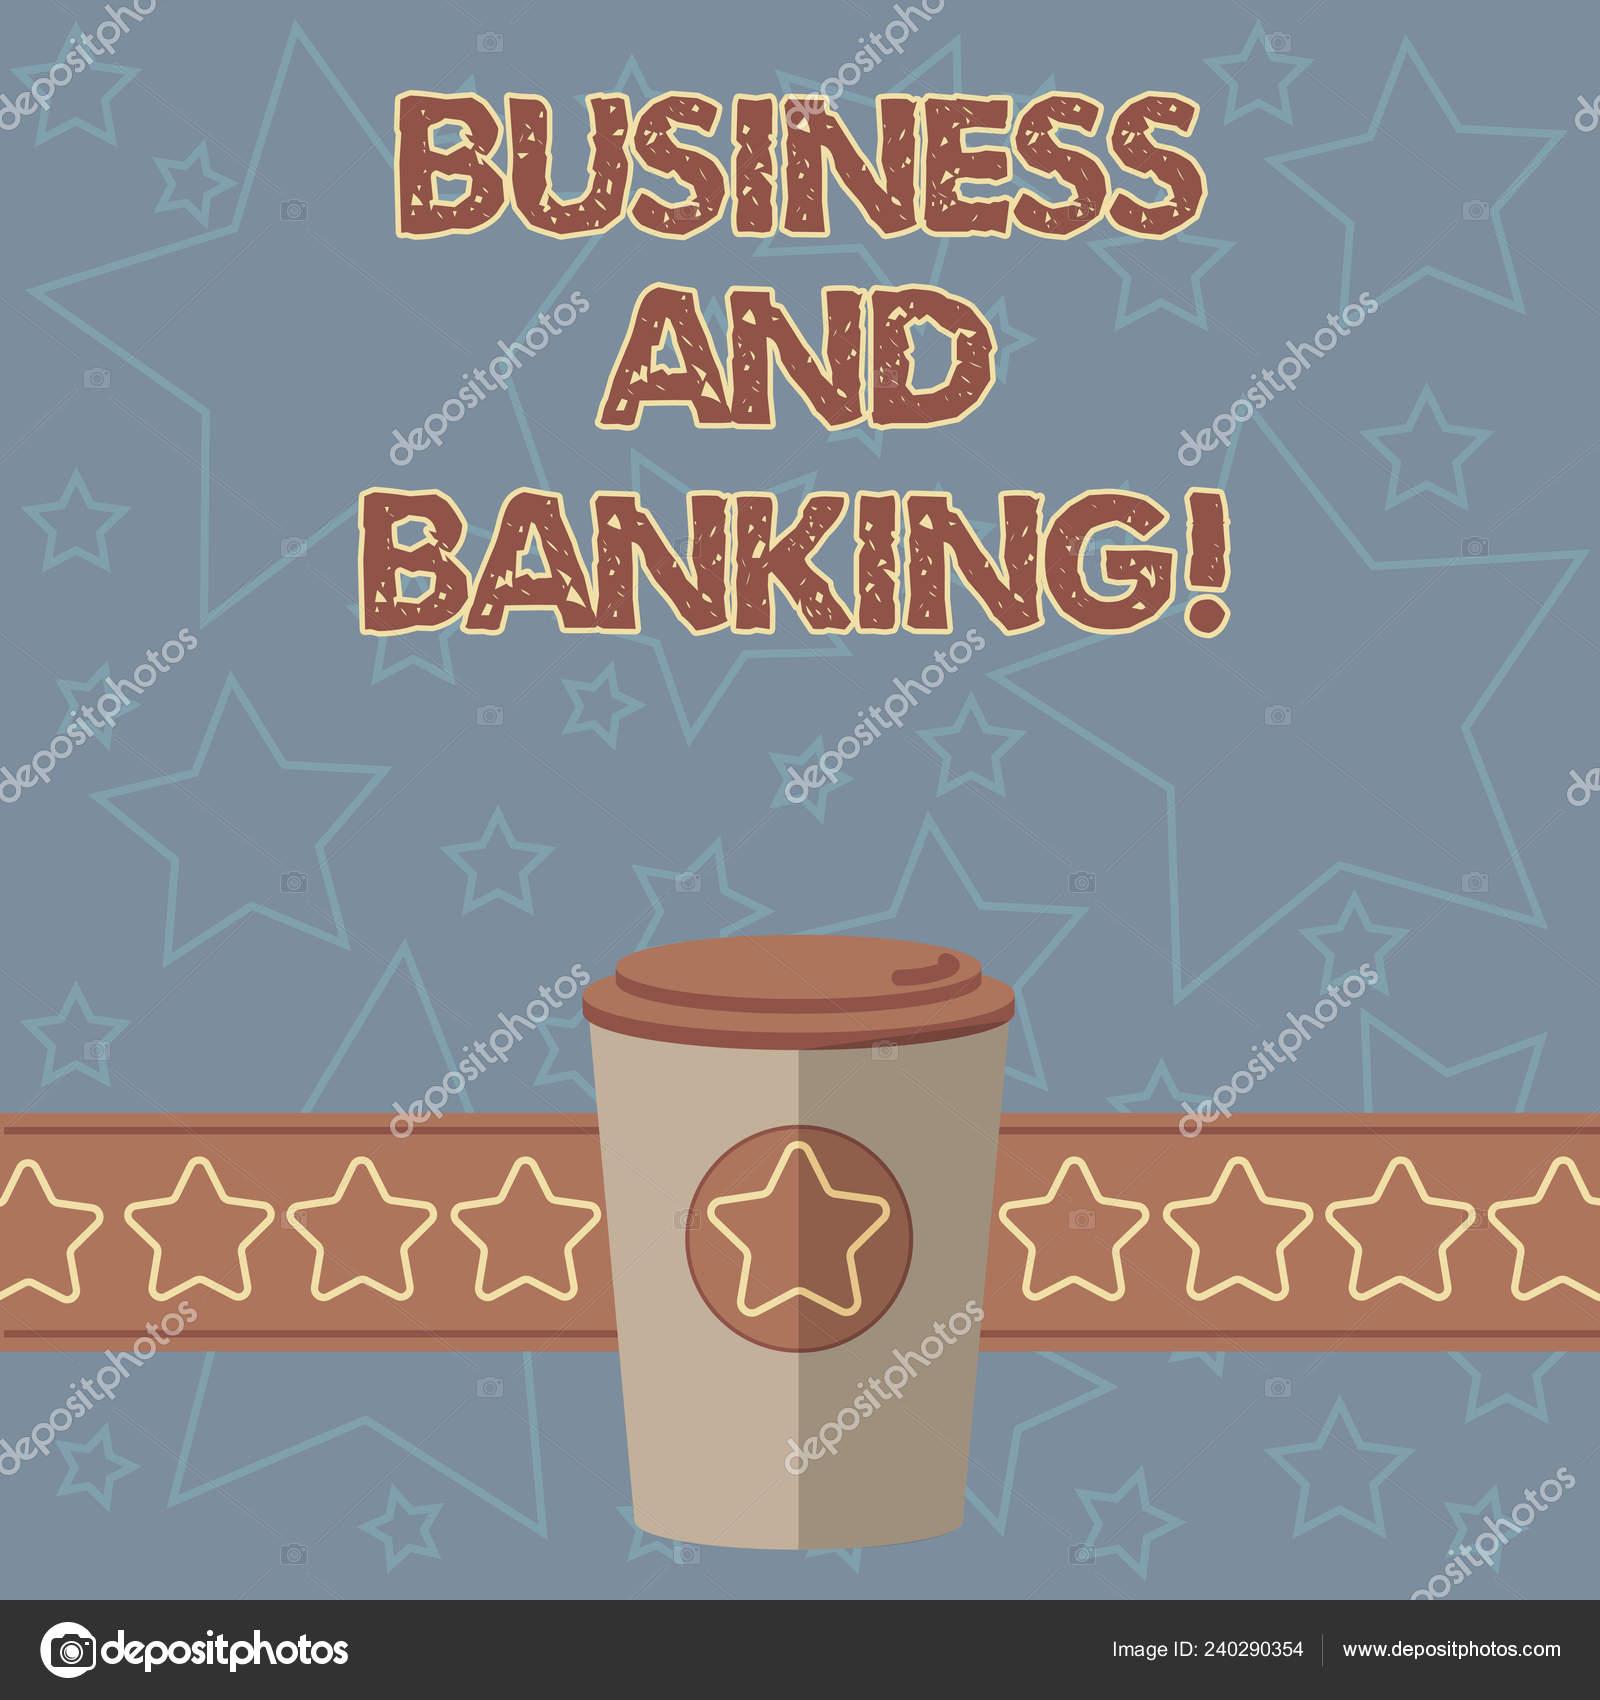 c40fe326f7 Χειρόγραφο κείμενο γράφοντας επιχειρήσεων και τραπεζών. Έννοια που σημαίνει  εταιρεία s είναι οικονομικές συναλλαγές με ένα ίδρυμα 3d φλιτζάνι καφέ για  να ...